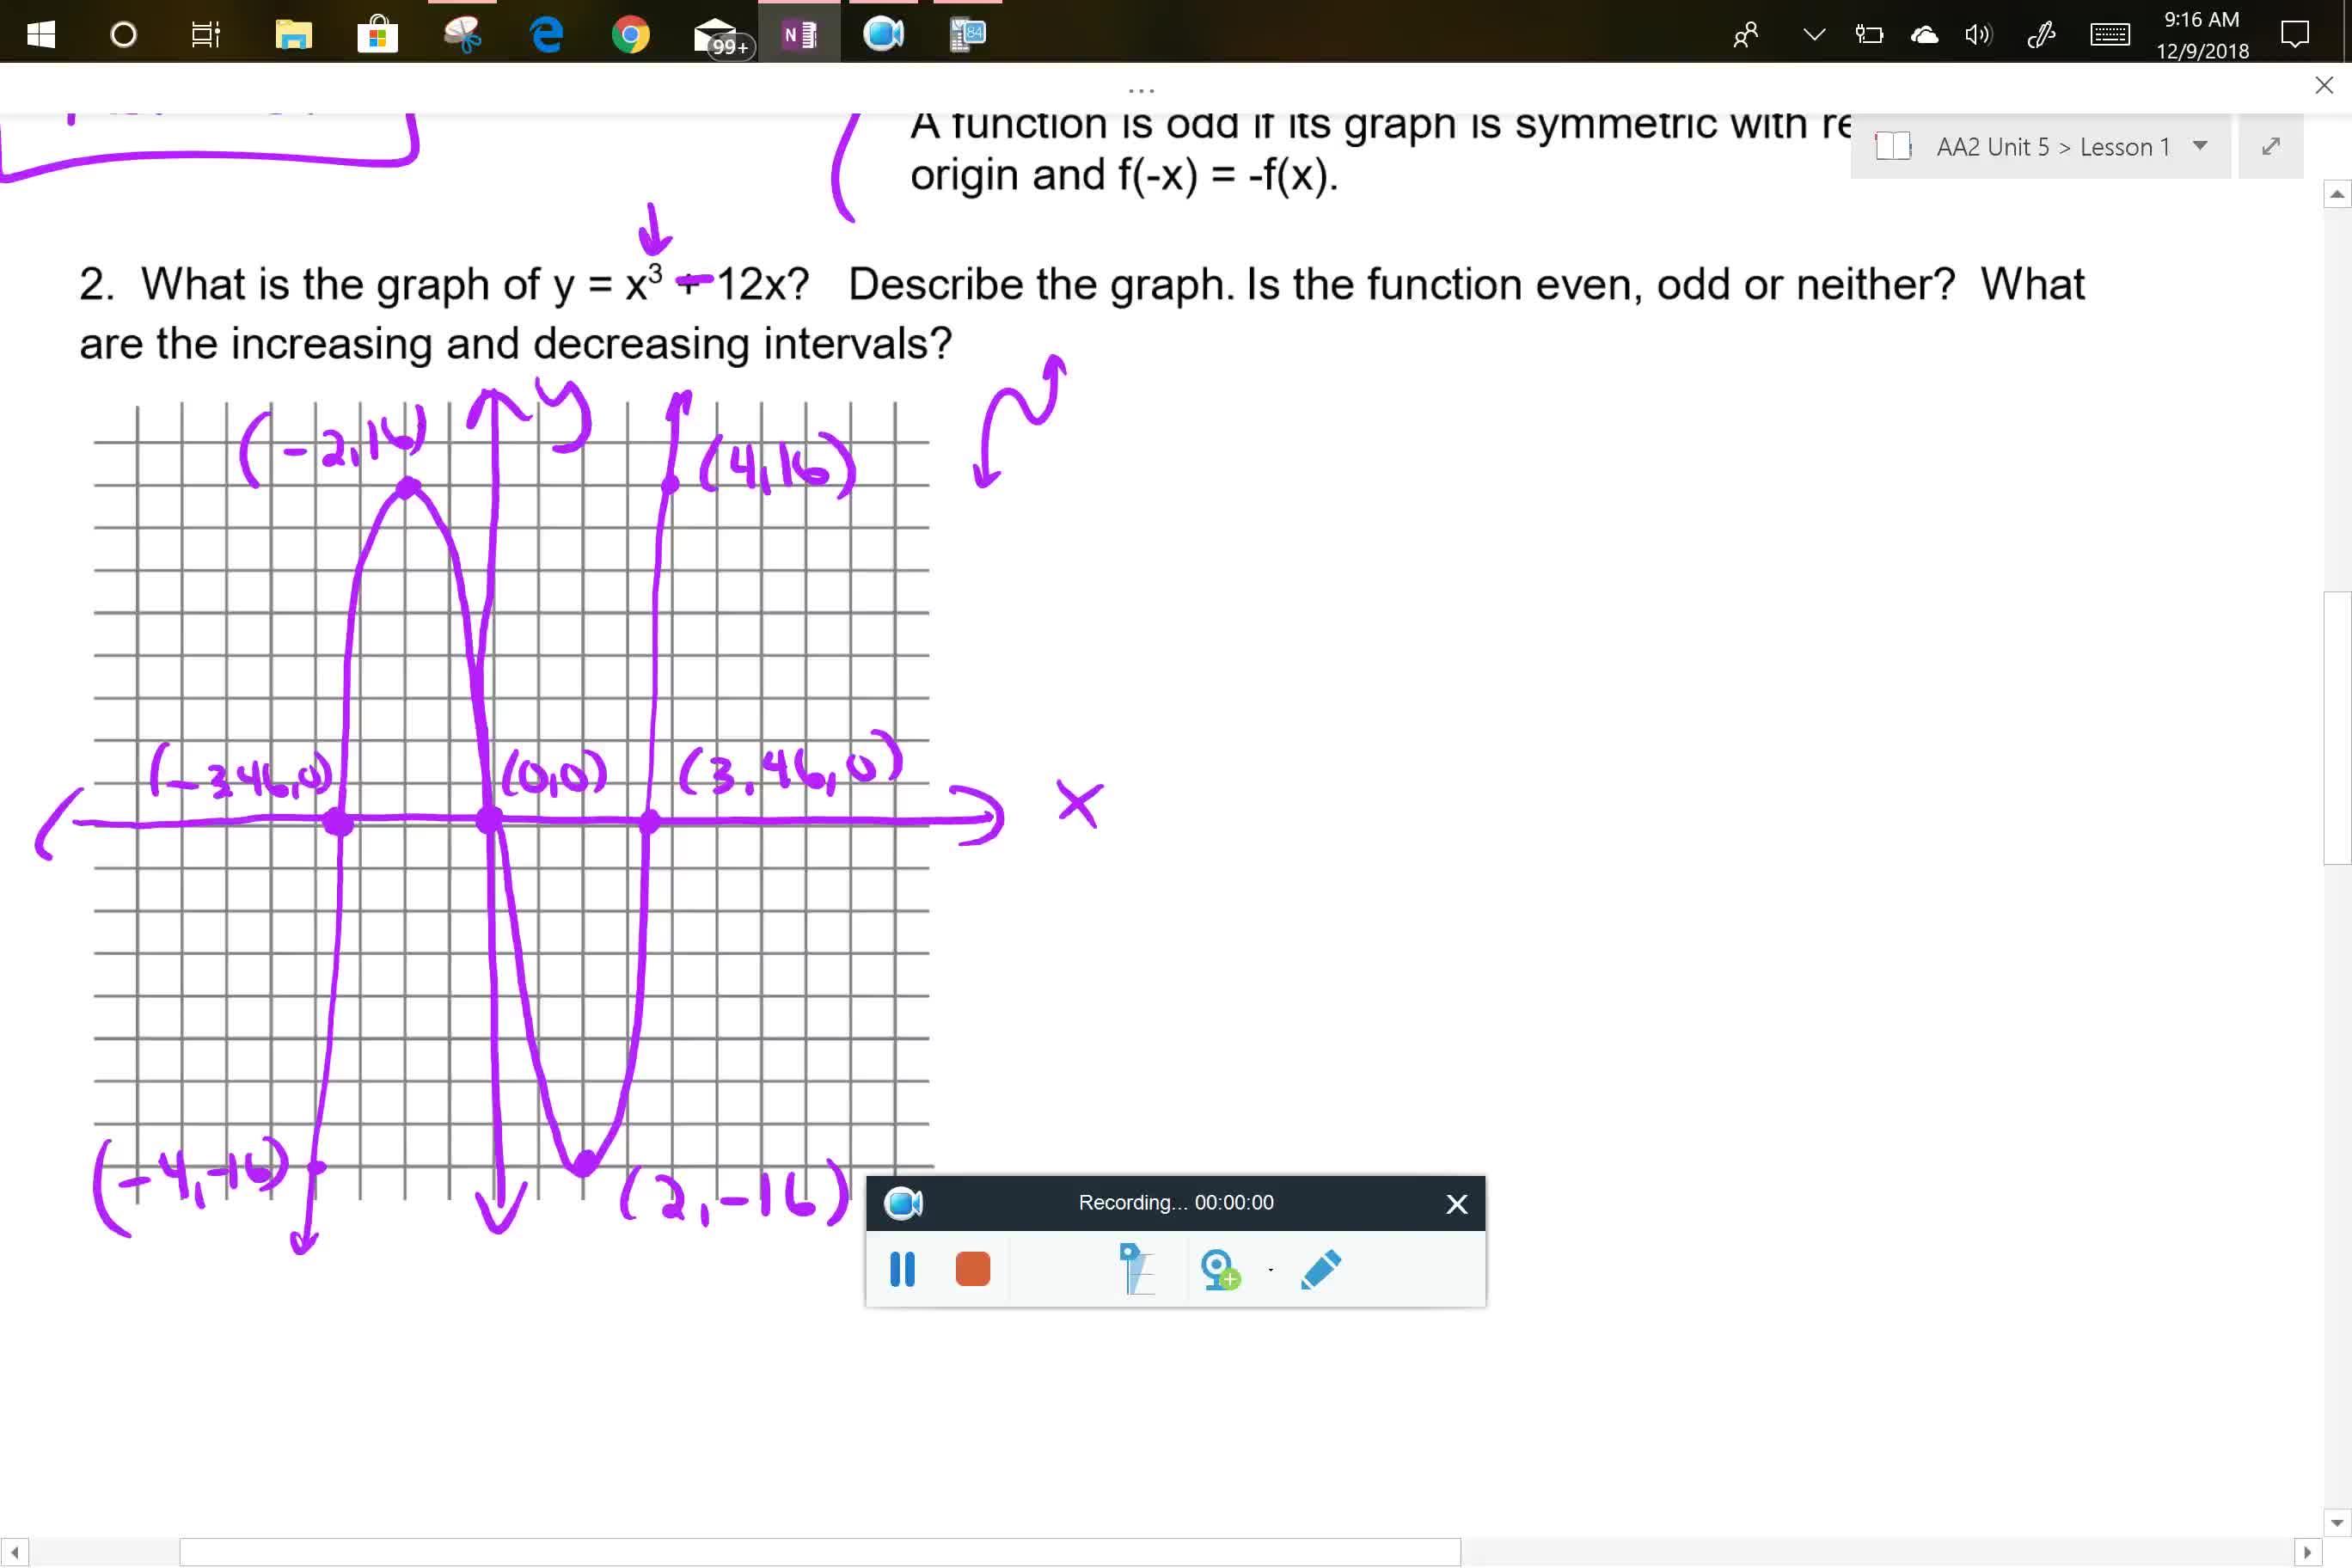 AA2 U5L1  Problem 2 part 2